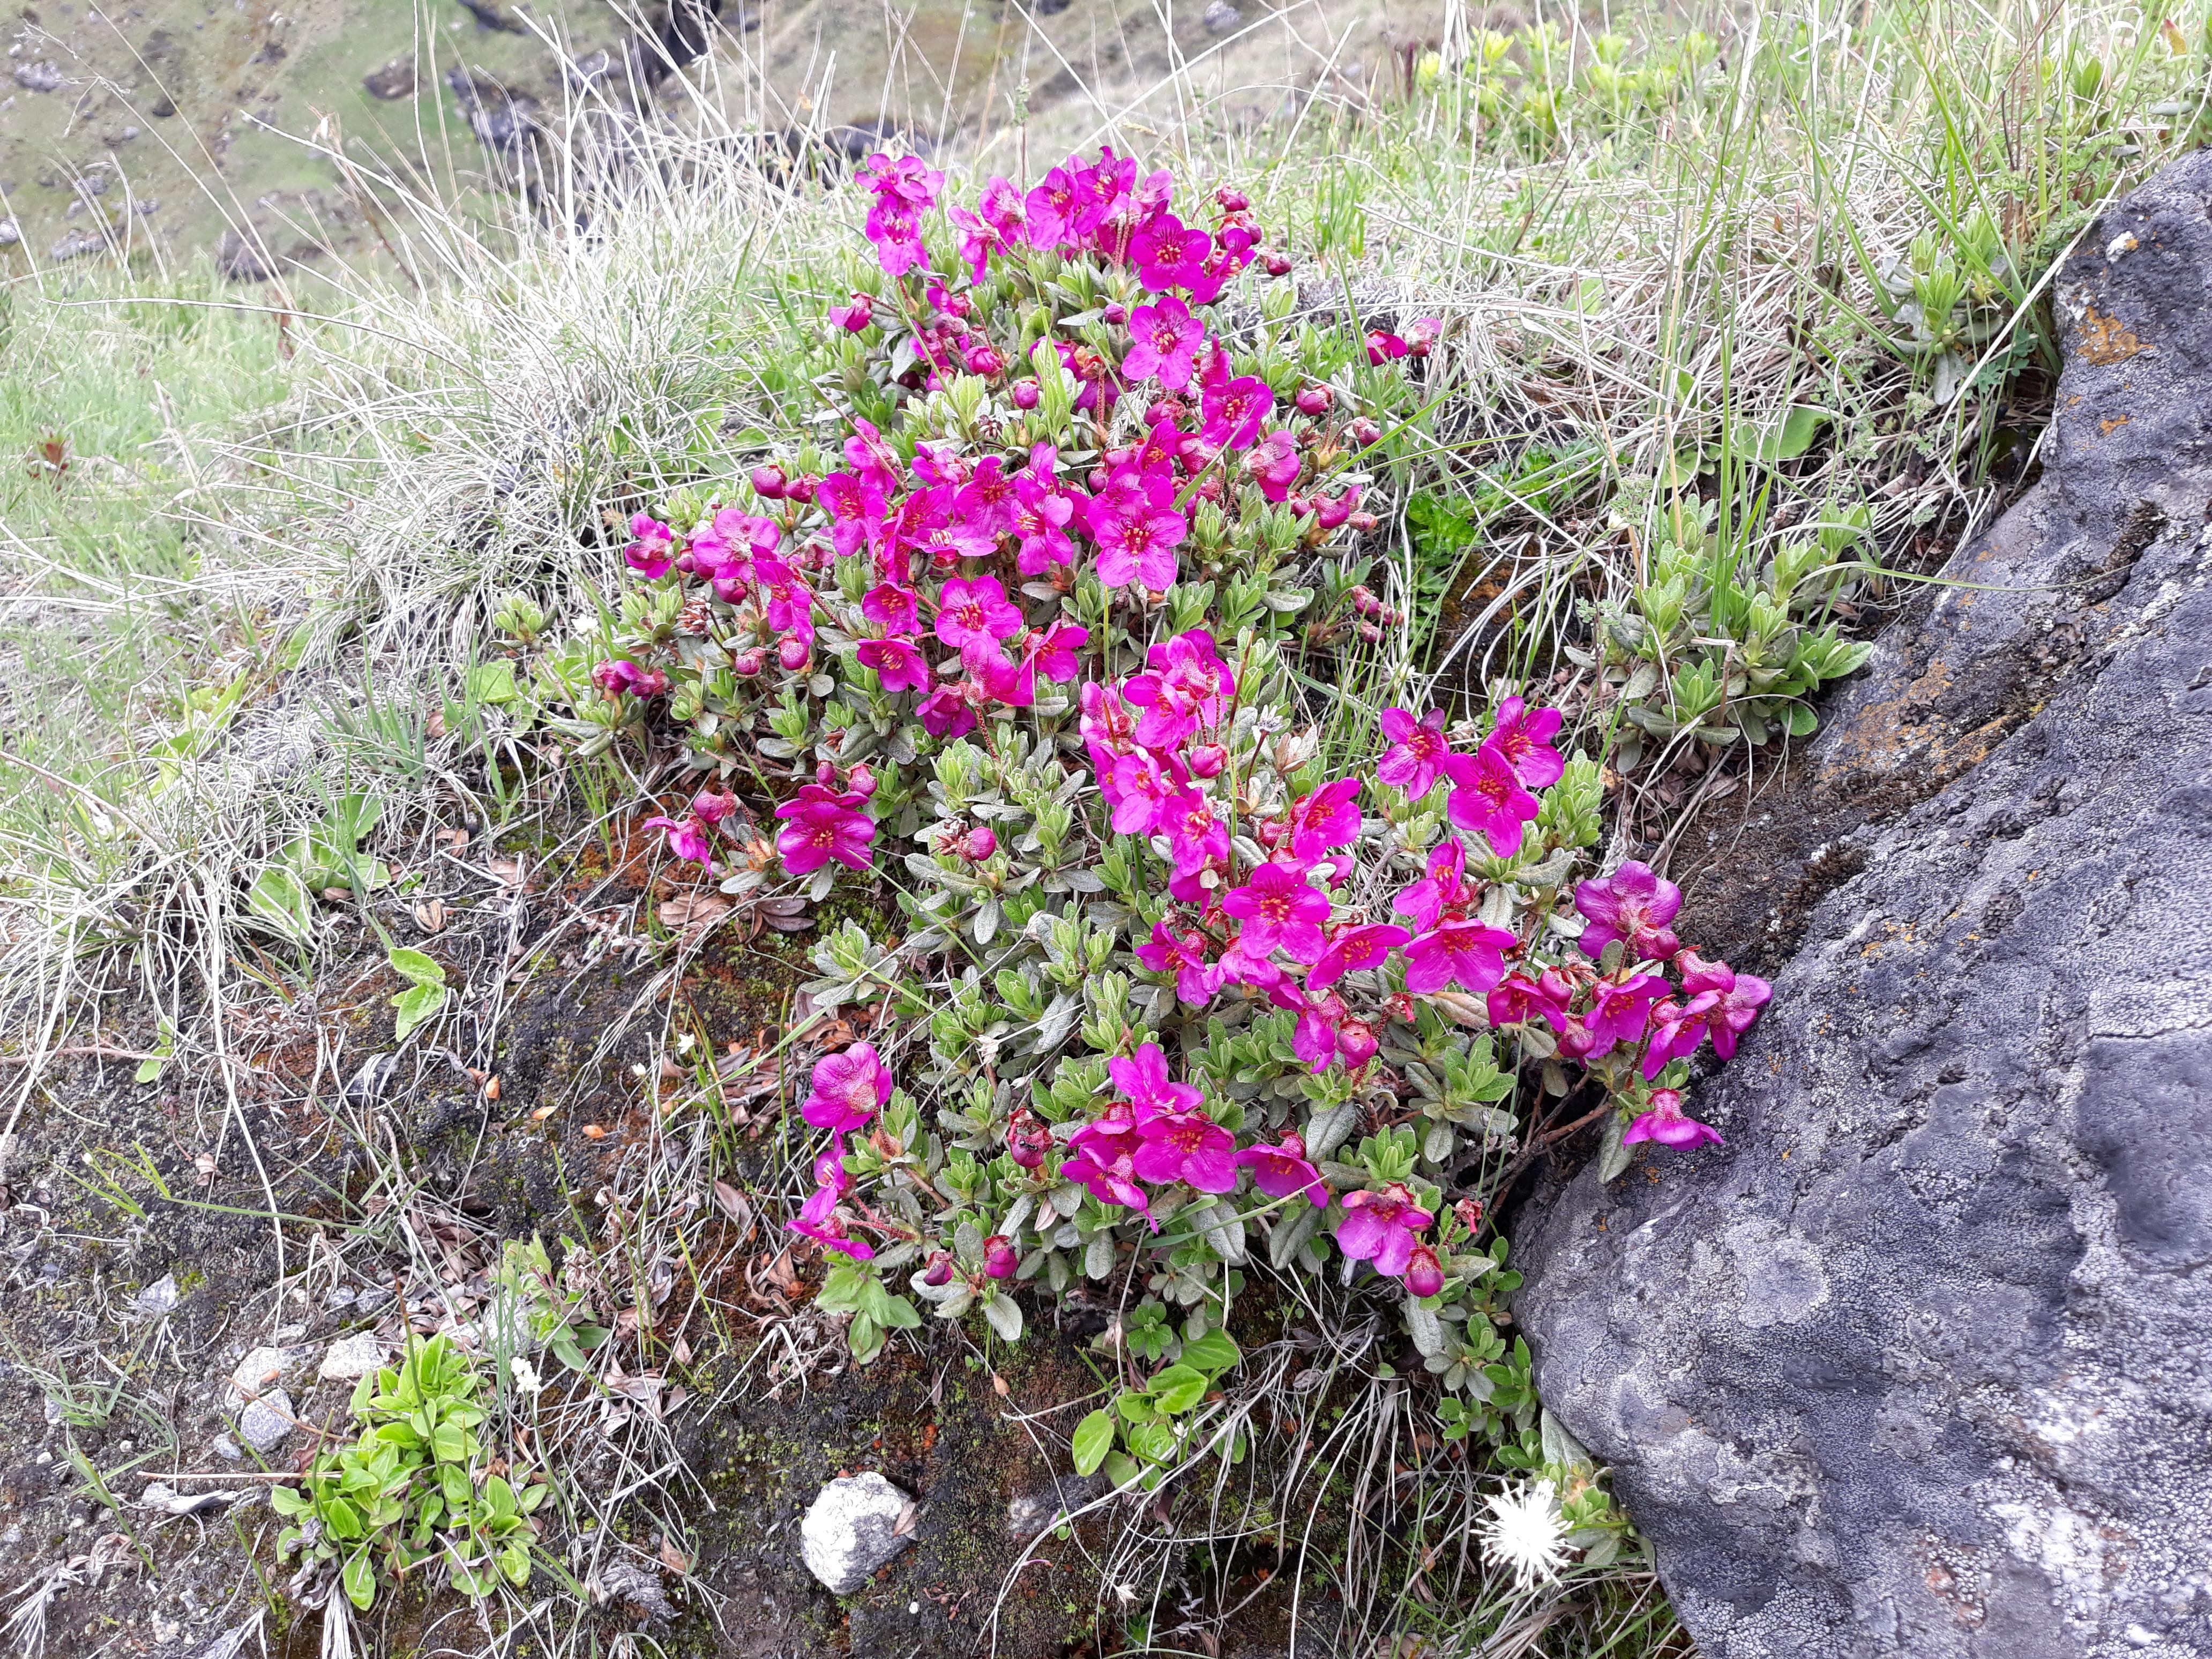 flower across the trail